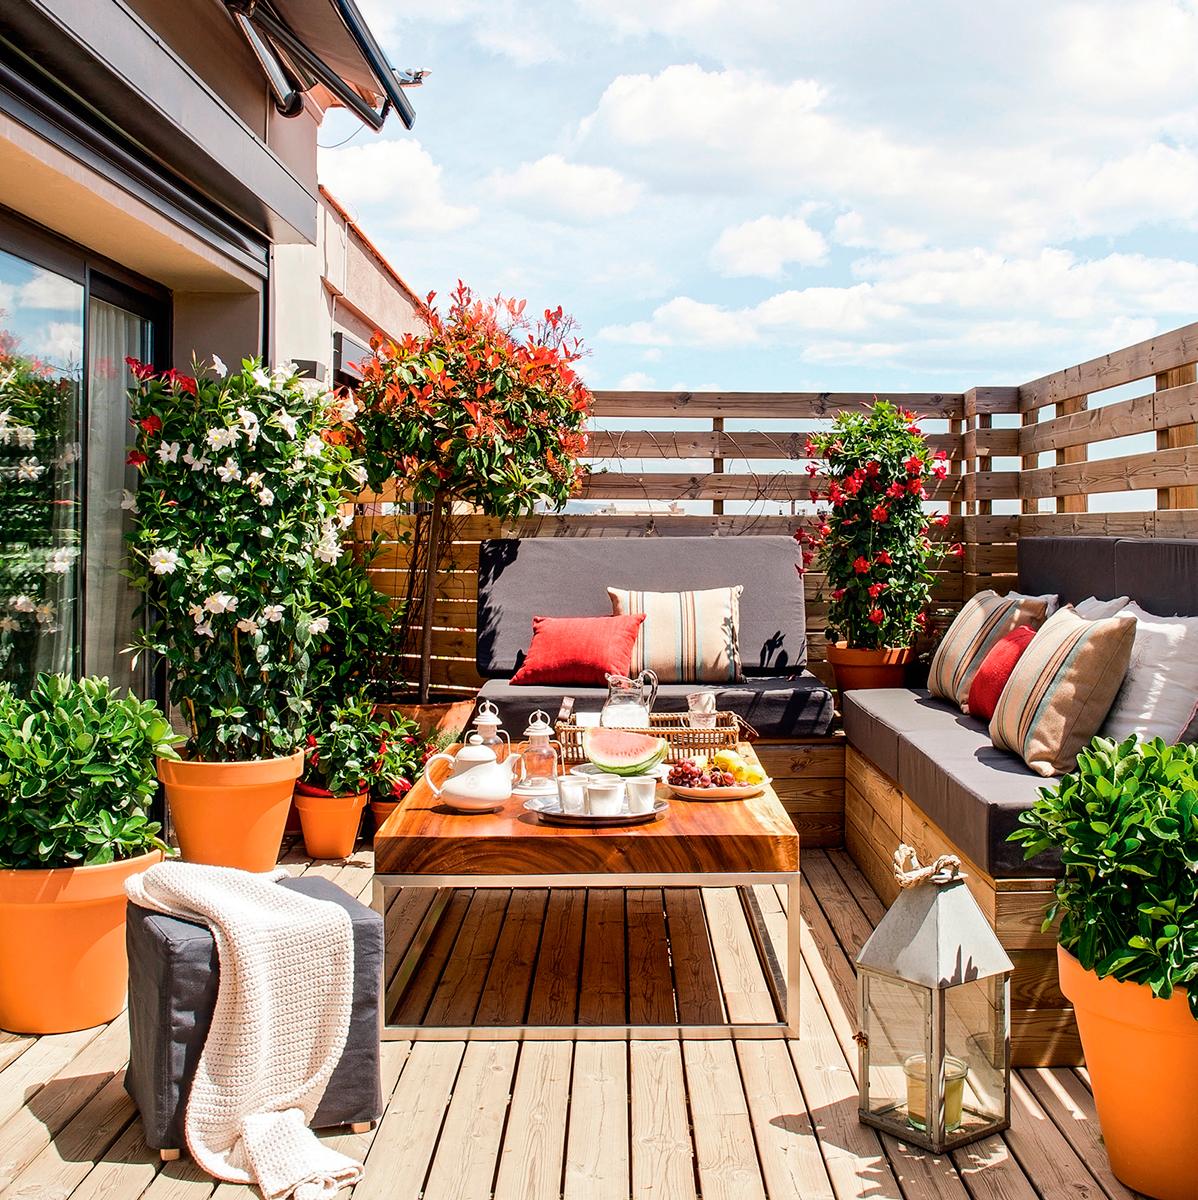 Jardin de fleurs sur la terrasse